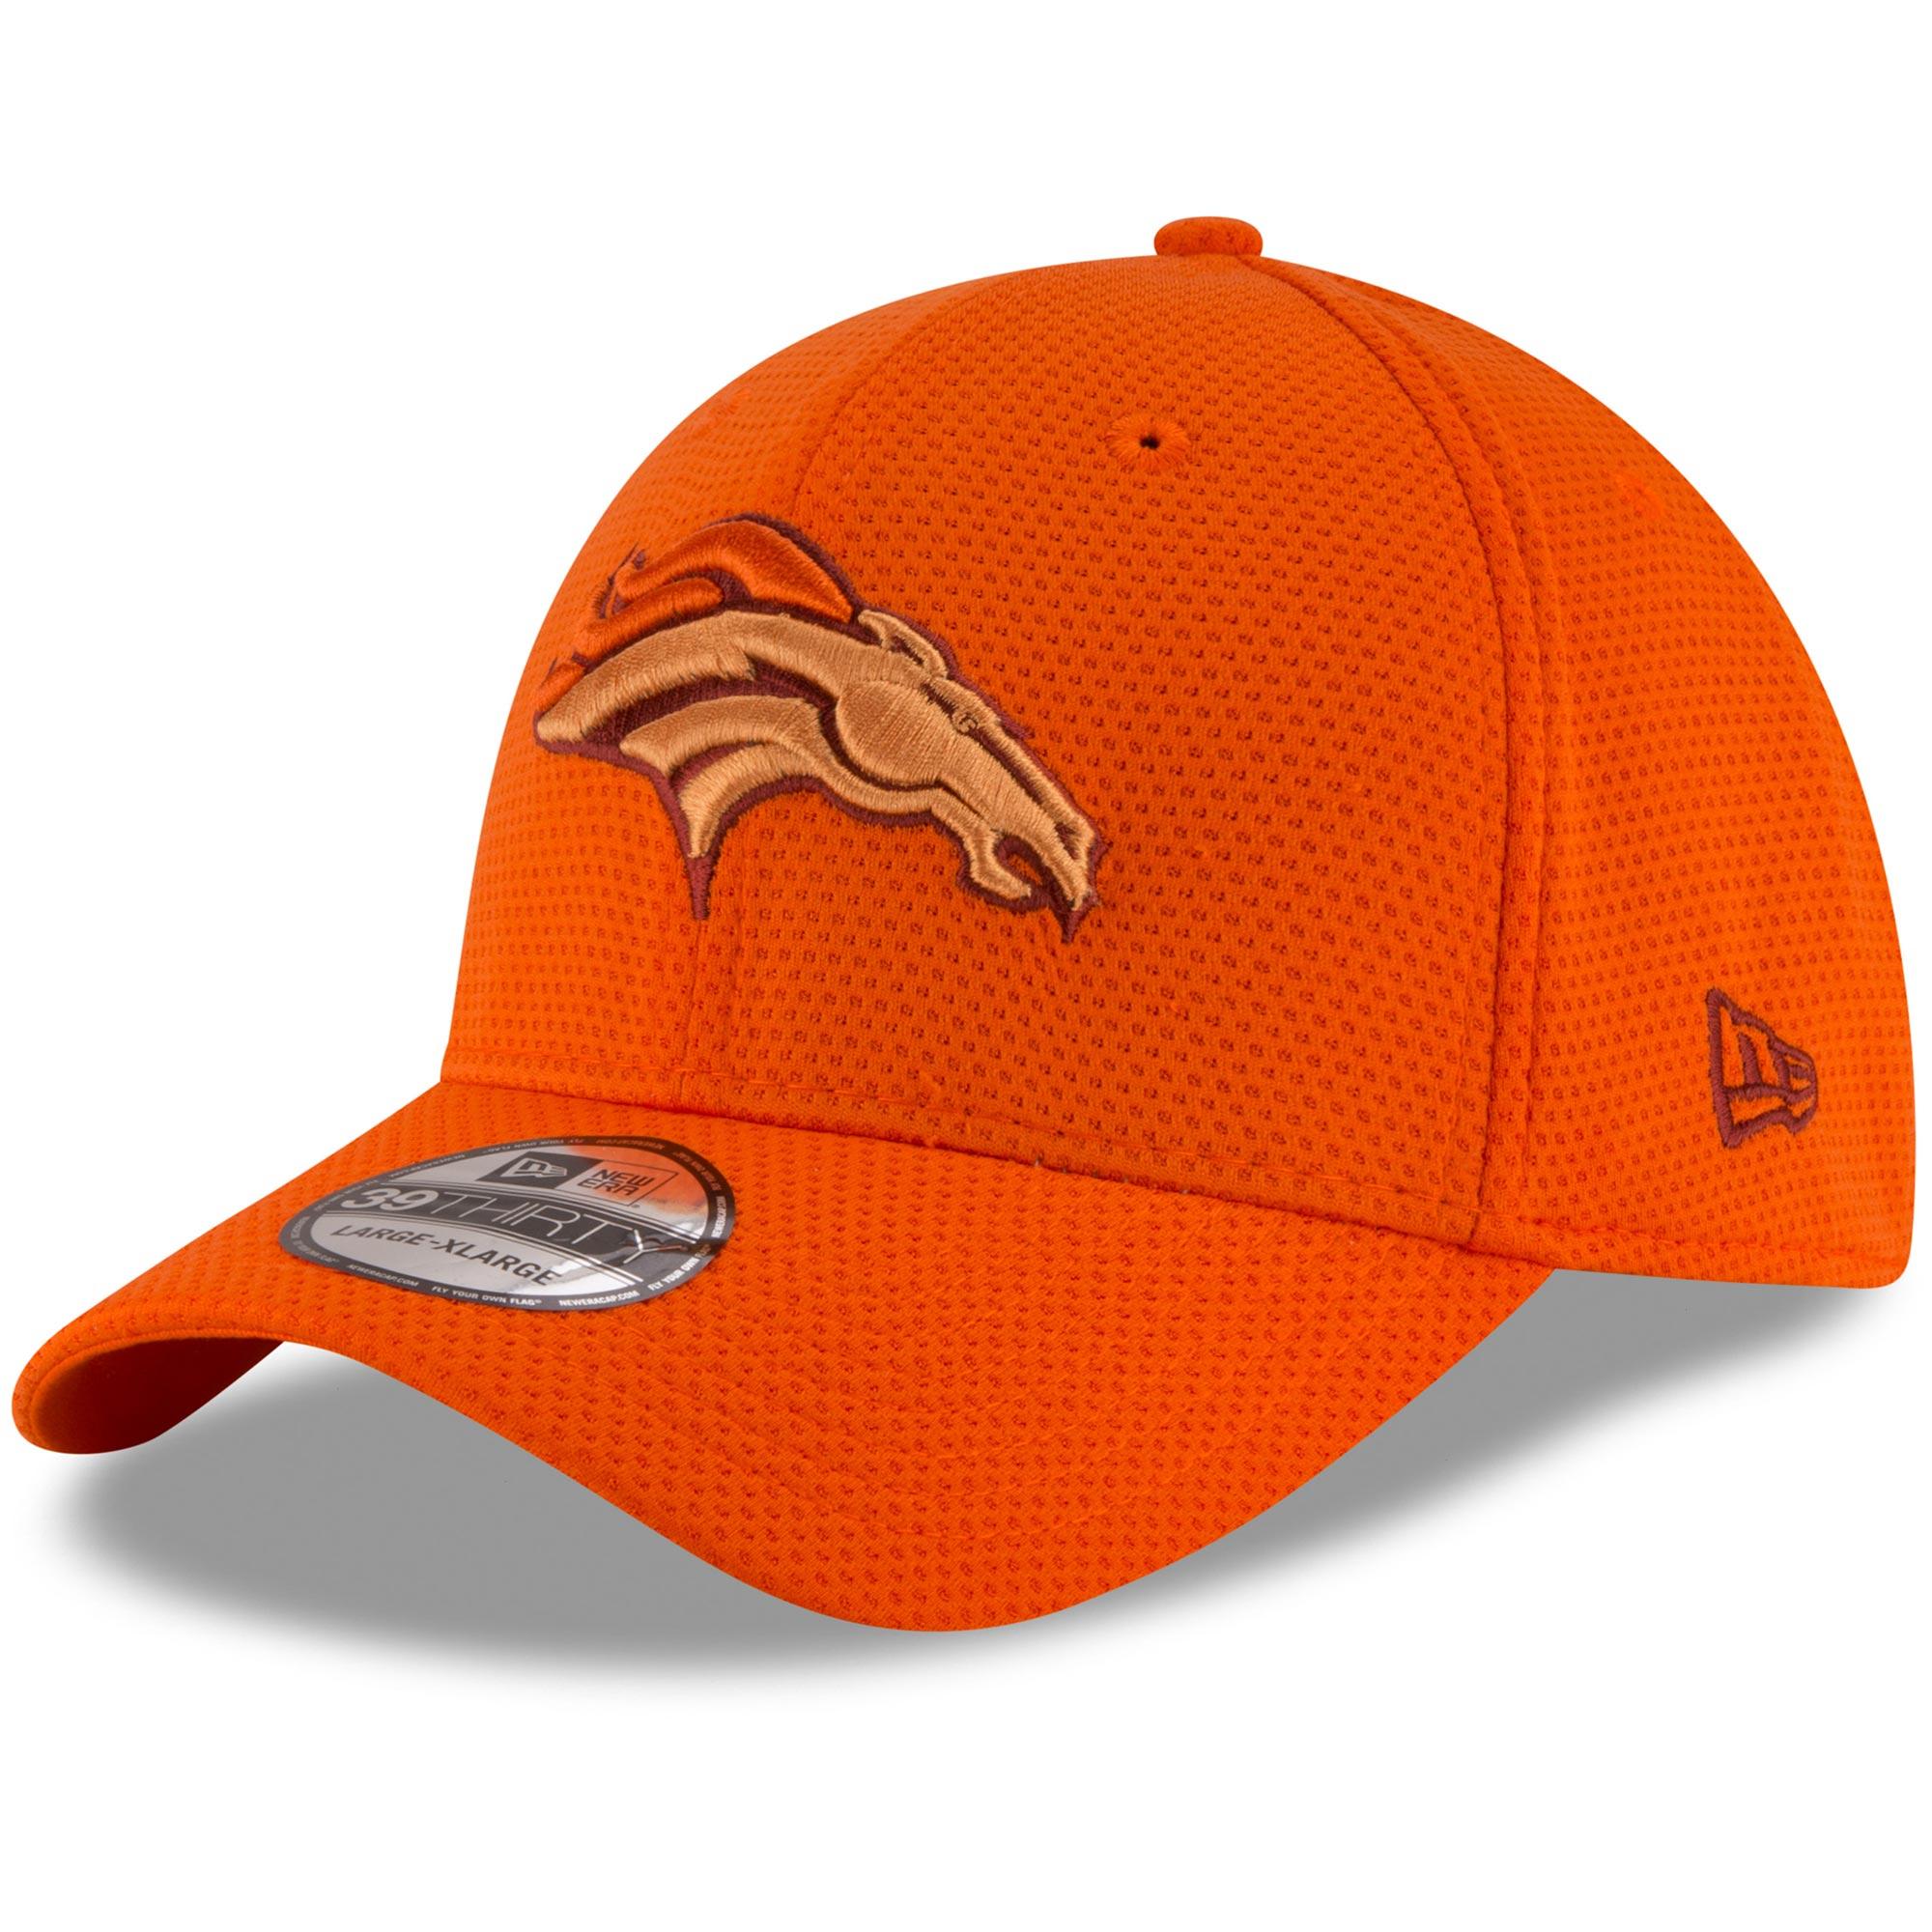 Denver Broncos New Era Team Color Tone Tech Redux 39THIRTY Flex Hat - Orange